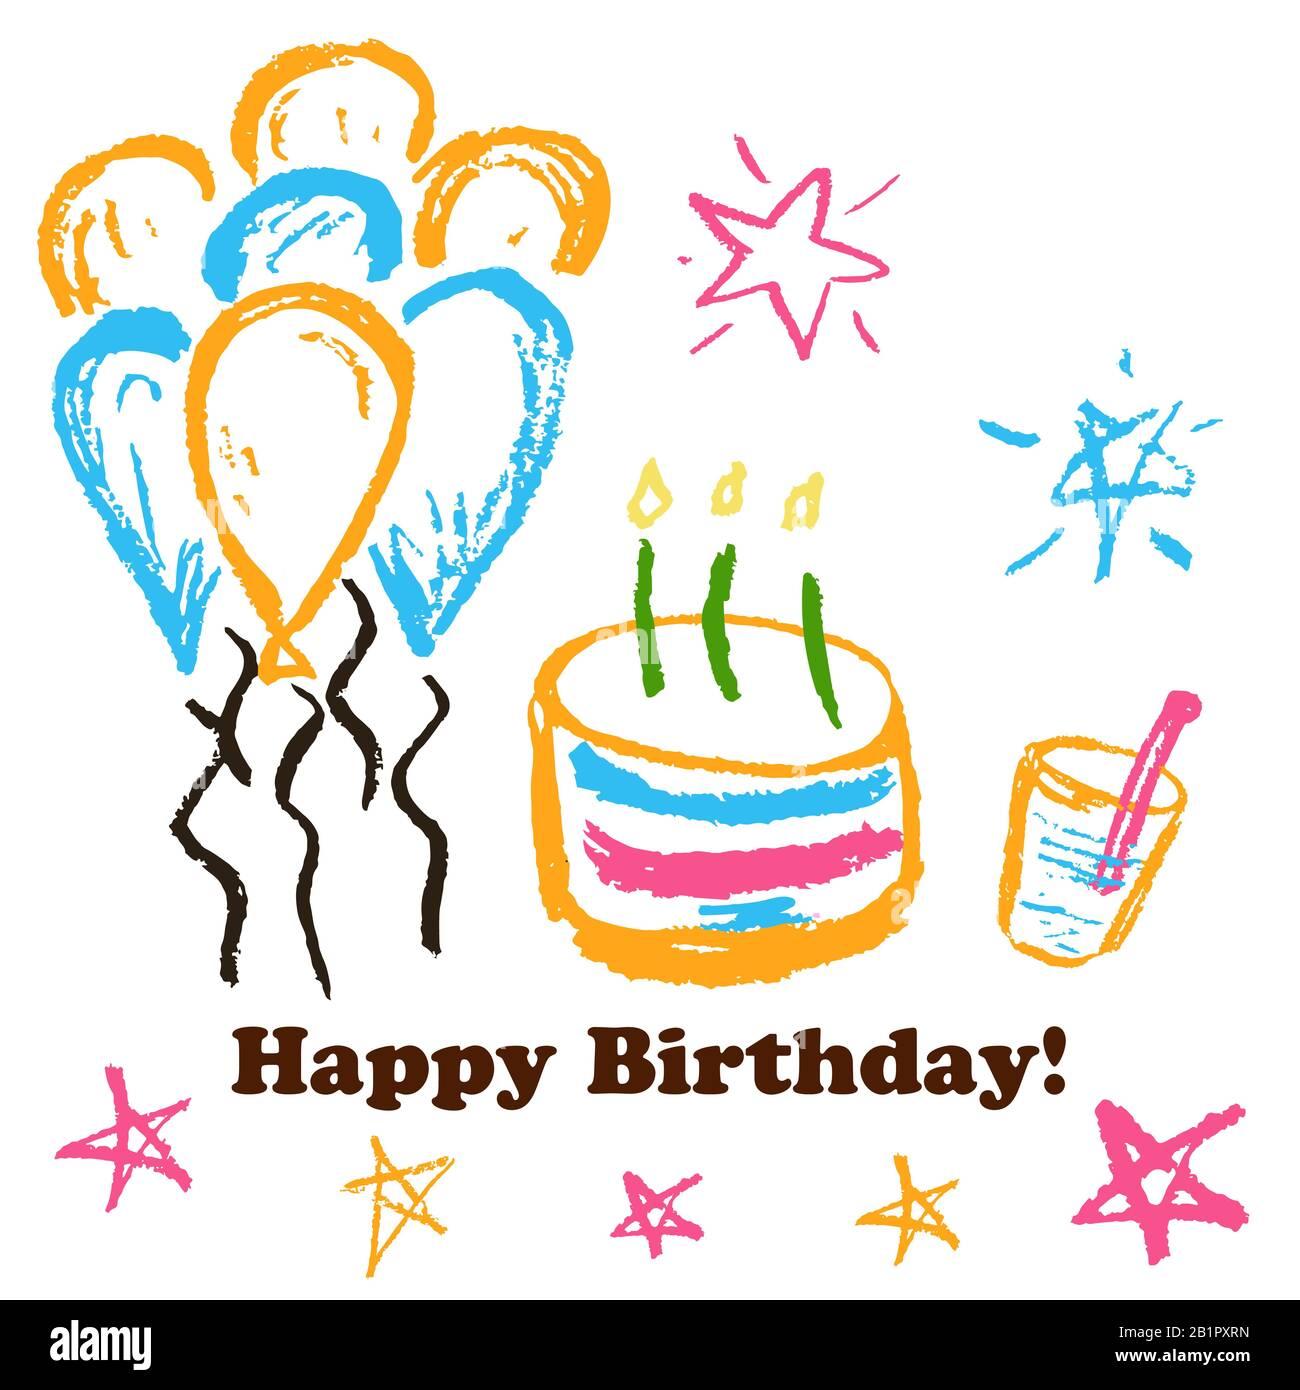 Children S Drawings Greeting Card Flyer Banner Happy Birthday Cake Balloons Stars Stock Vector Image Art Alamy